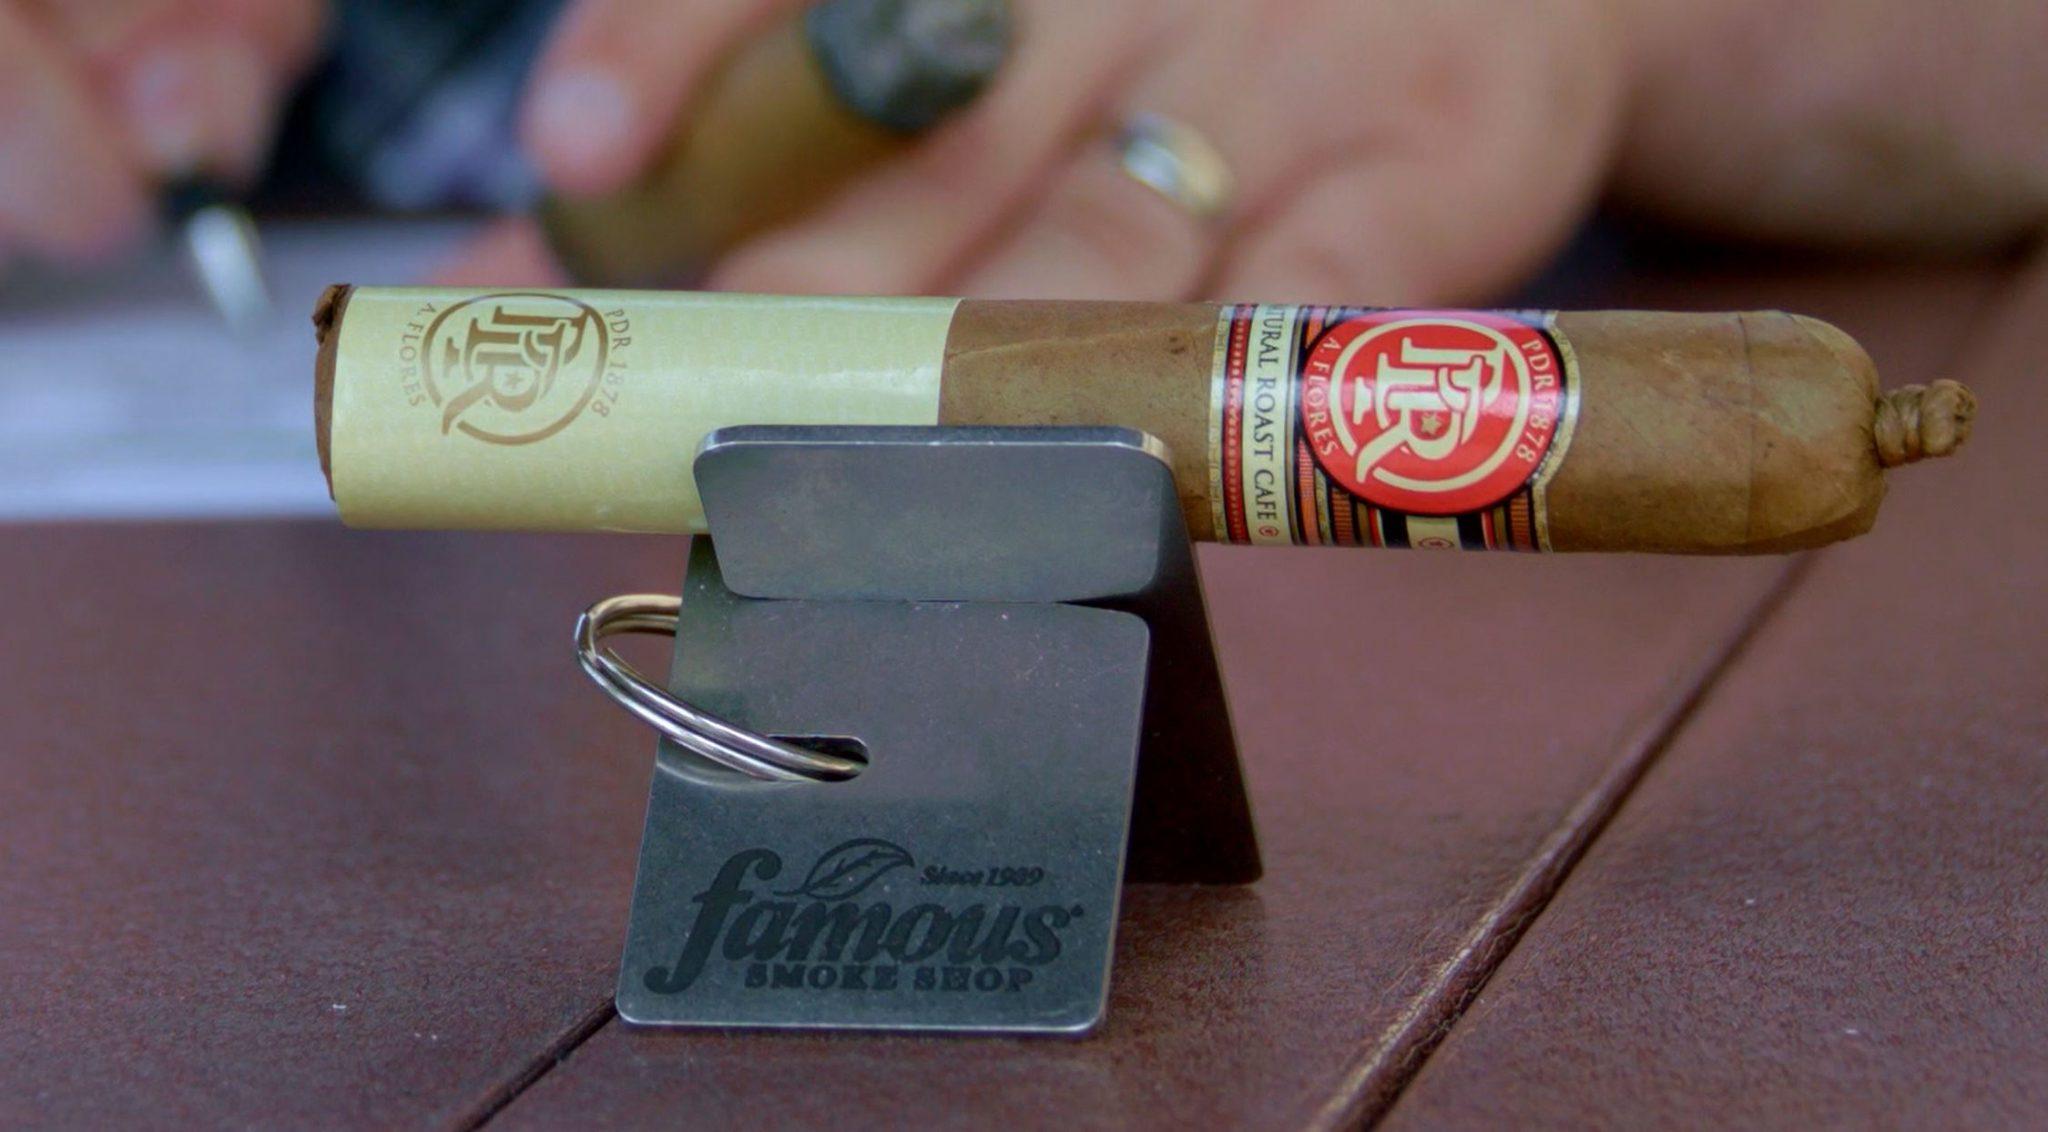 PDR cigars PDR 1878 Natural Roast Café Cigar Review cigar tasting notes